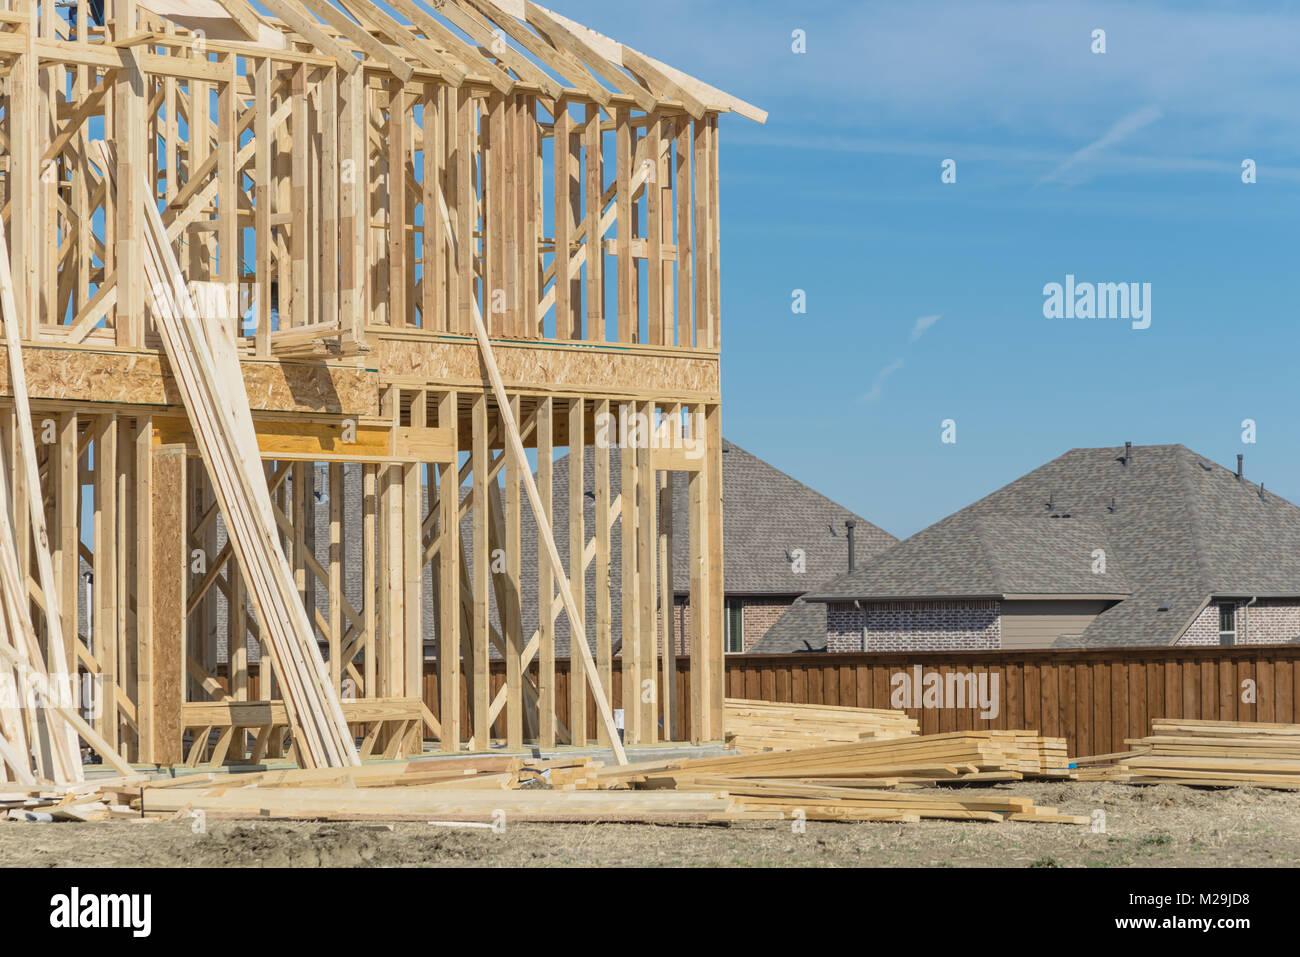 Groß Texas Holzrahmen Ideen - Benutzerdefinierte Bilderrahmen Ideen ...